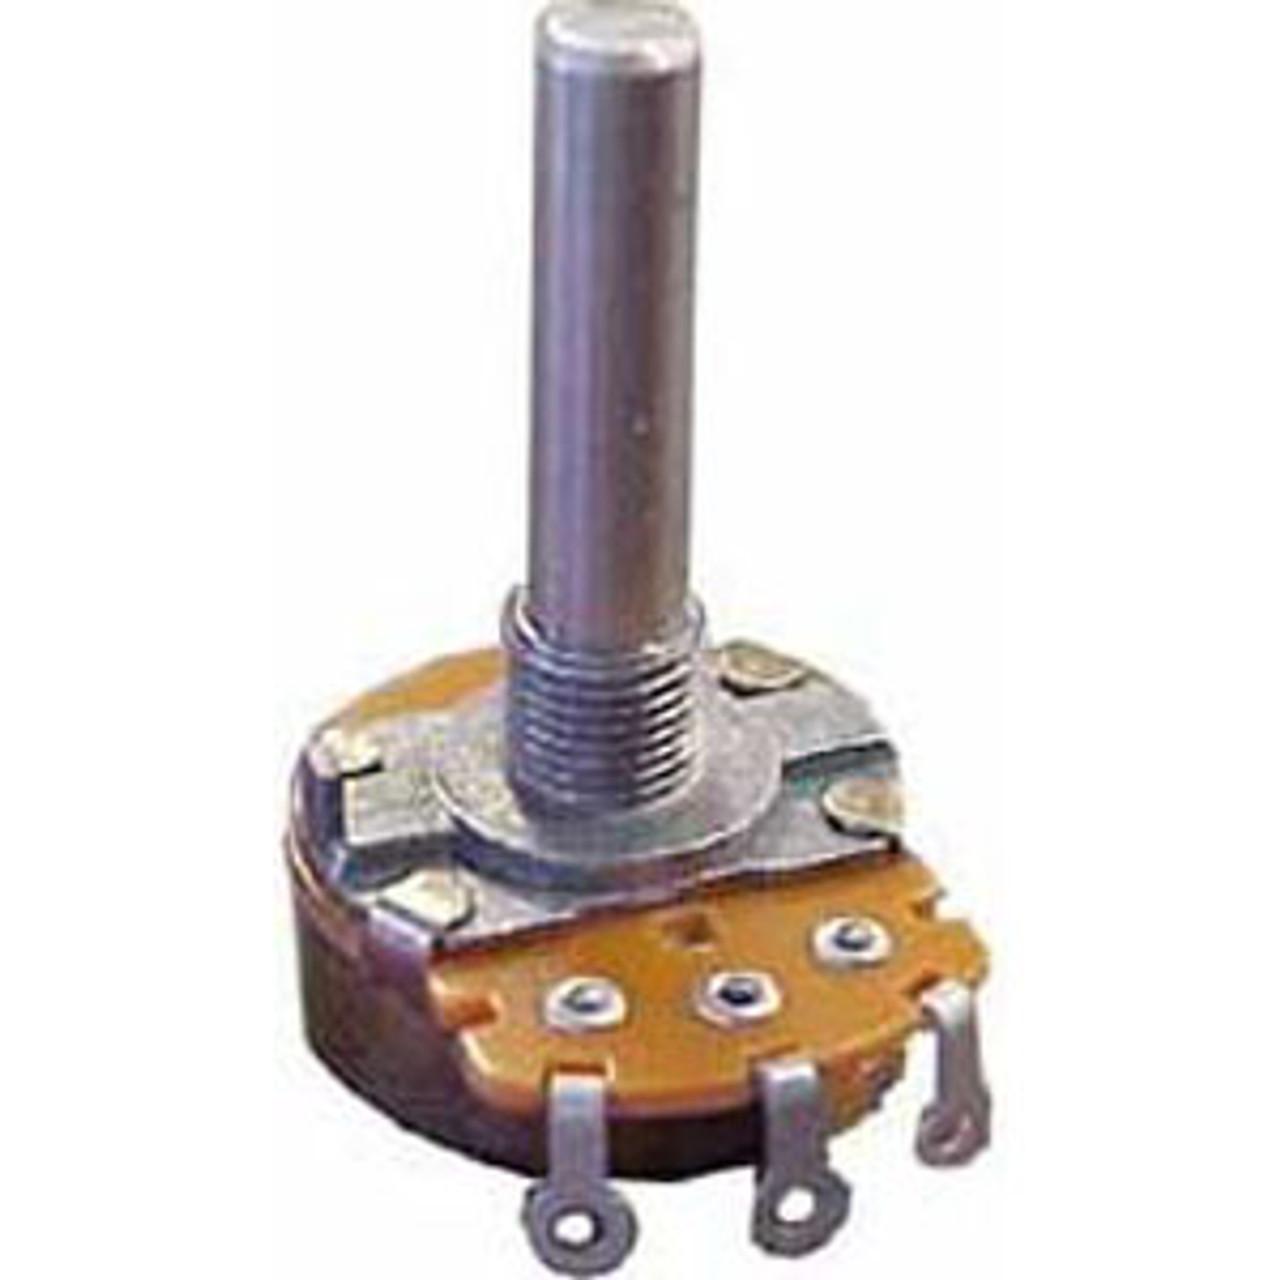 Potentiometer - 10K Linear Taper - 16MM -With Switch Linear taper with switch Solder lug terminals Max voltage: 150 VAC Audio 200 VAC Power rating: Linear 200mA, .2W Audio 100 mA, .1W Switch Rating 1.0 A @ 125V  AC/DC Bushing diameter 7 mm Shaft 30mm w/flat 12mm, 6mm OD